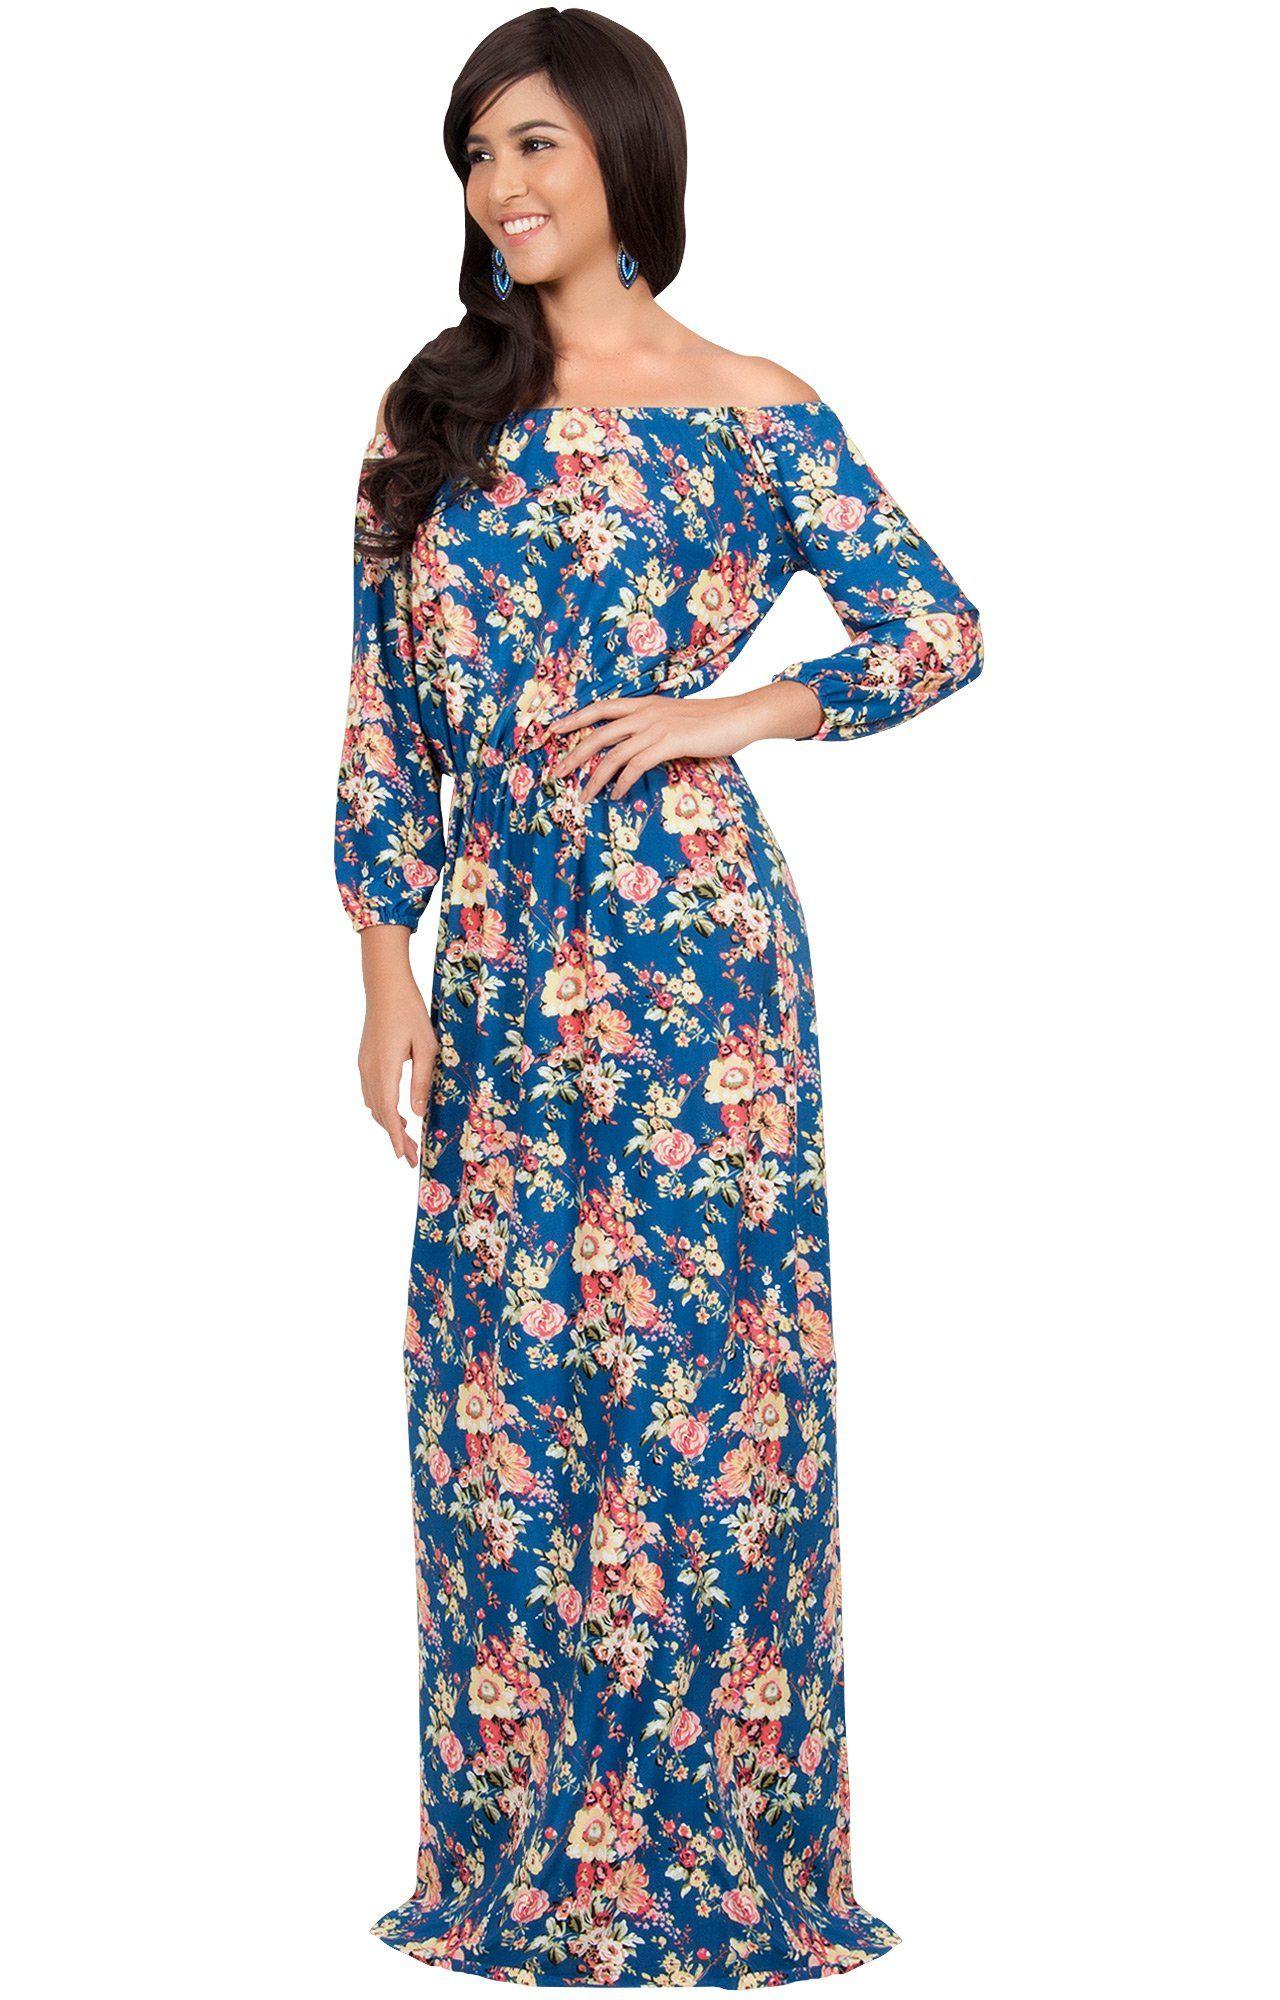 3d8ed2cc096 Maternity Fashion - KOH KOH Plus Size Women Long Off Shoulder Summer Floral  Print Cute Boho